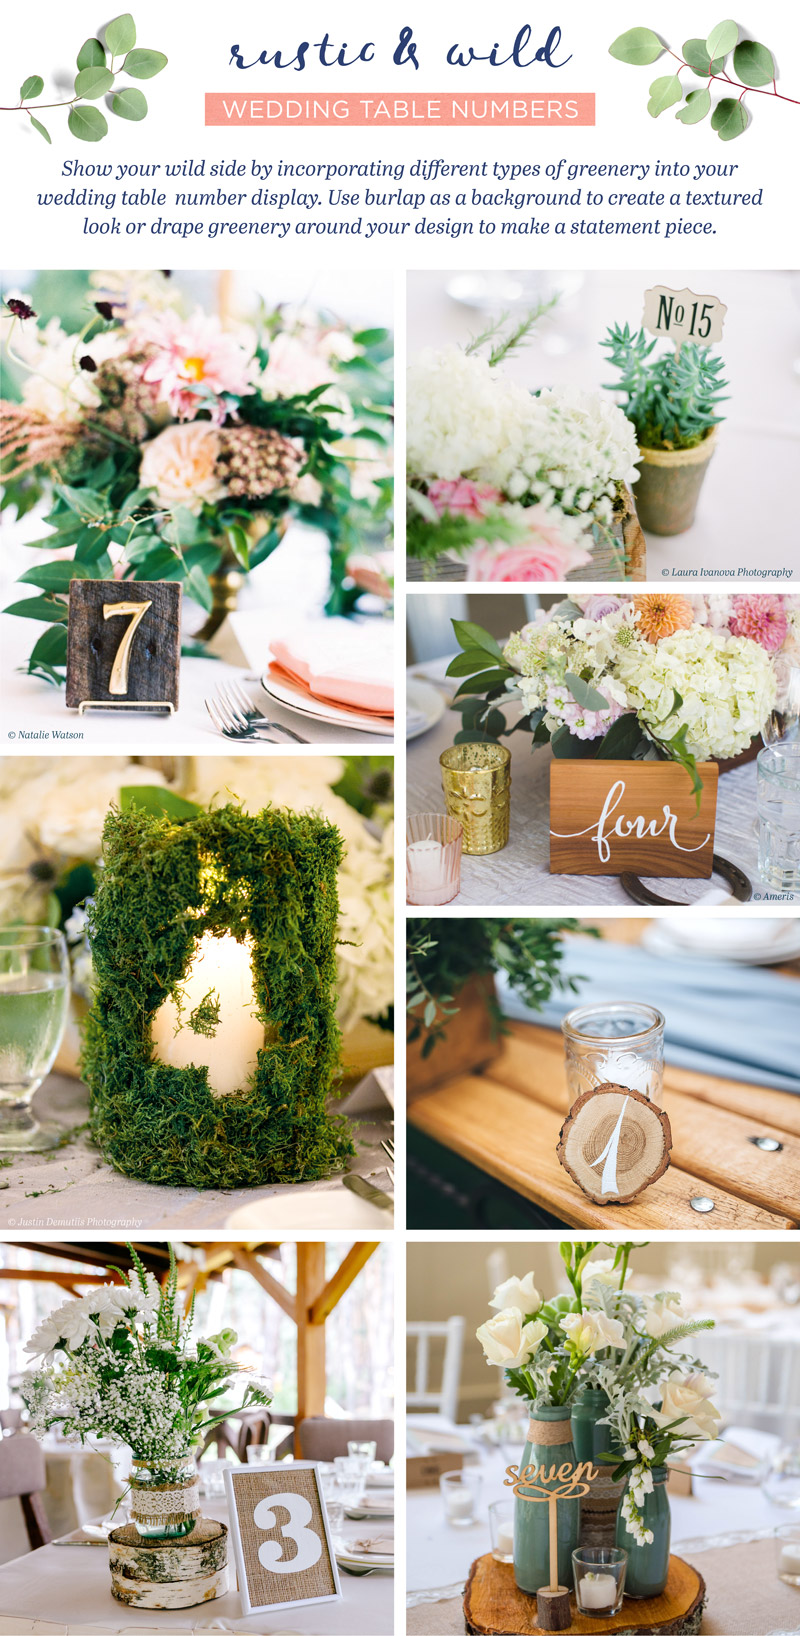 wedding-table-numbers-rustic